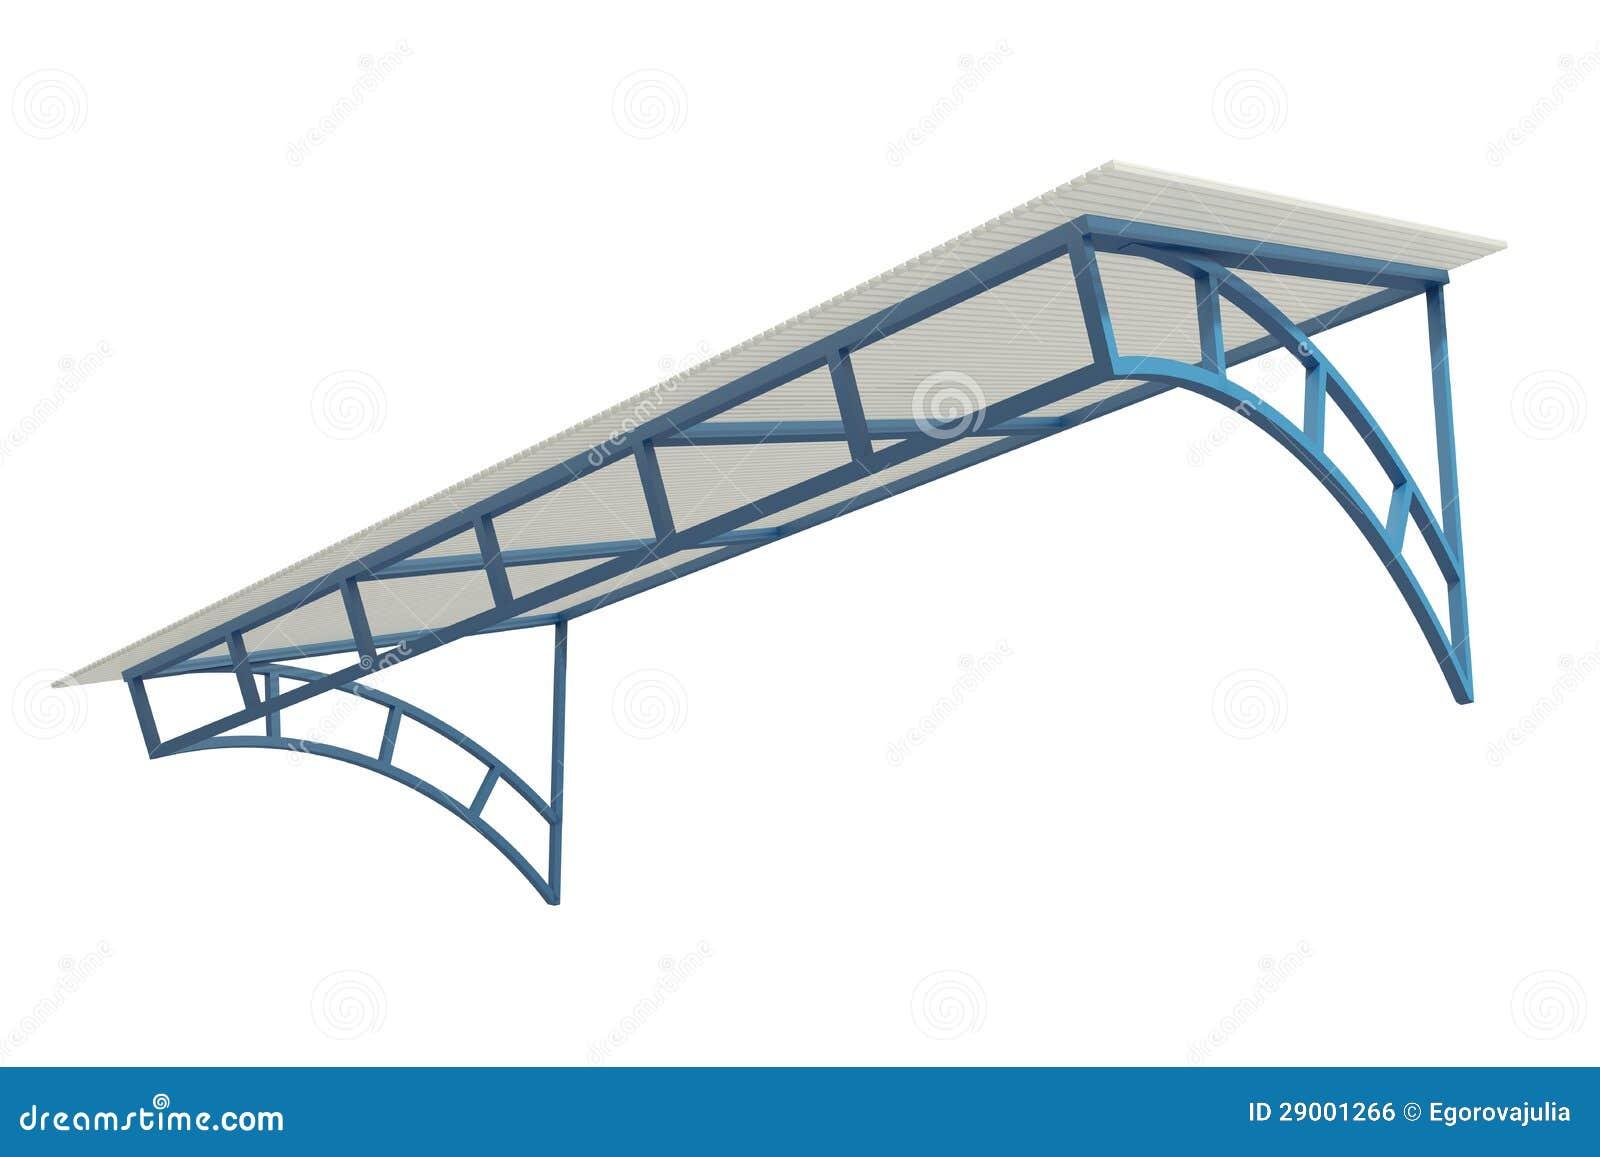 Wrought Iron Canopy Royalty Free Stock Image Image 29001266